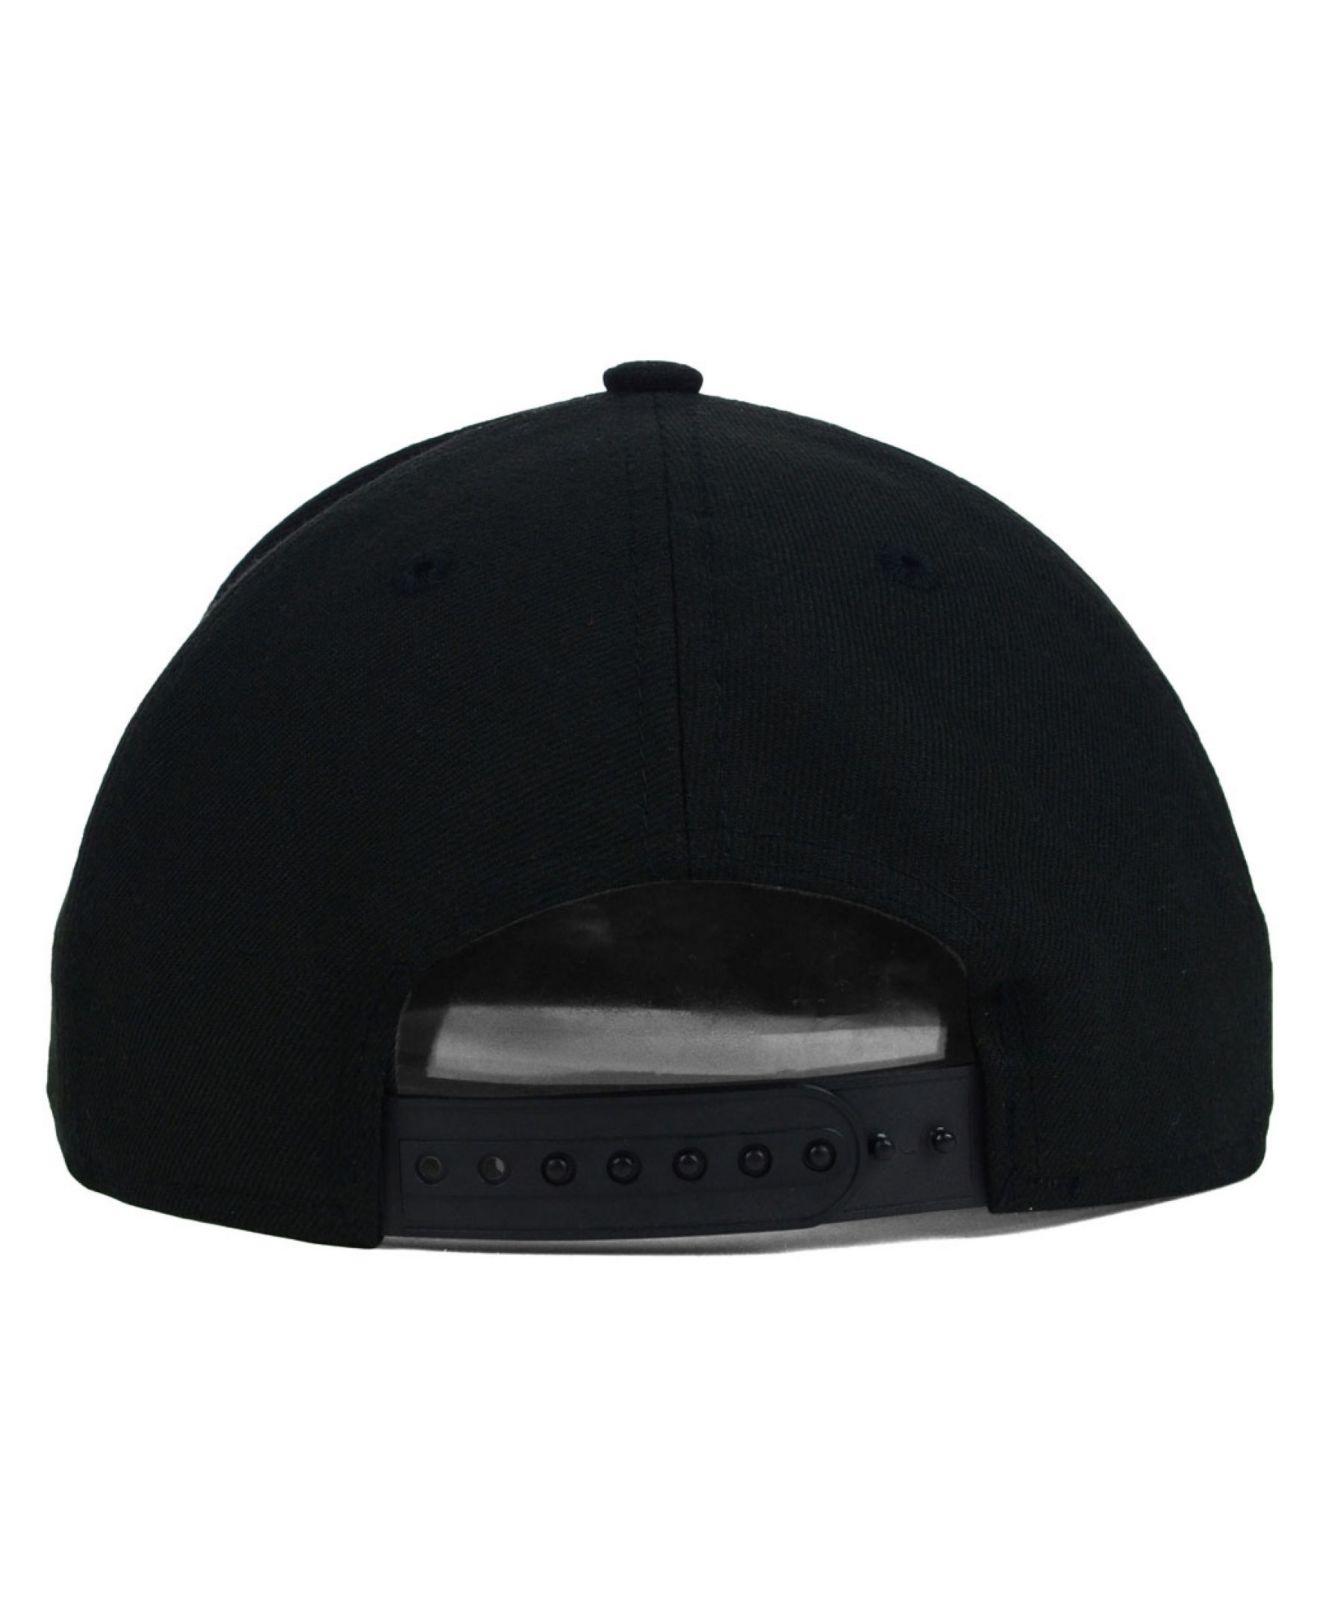 681a3b2f172 ... 50% off lyst ktz miami dolphins original fit 9fifty snapback cap in  black ab47f ecfc6